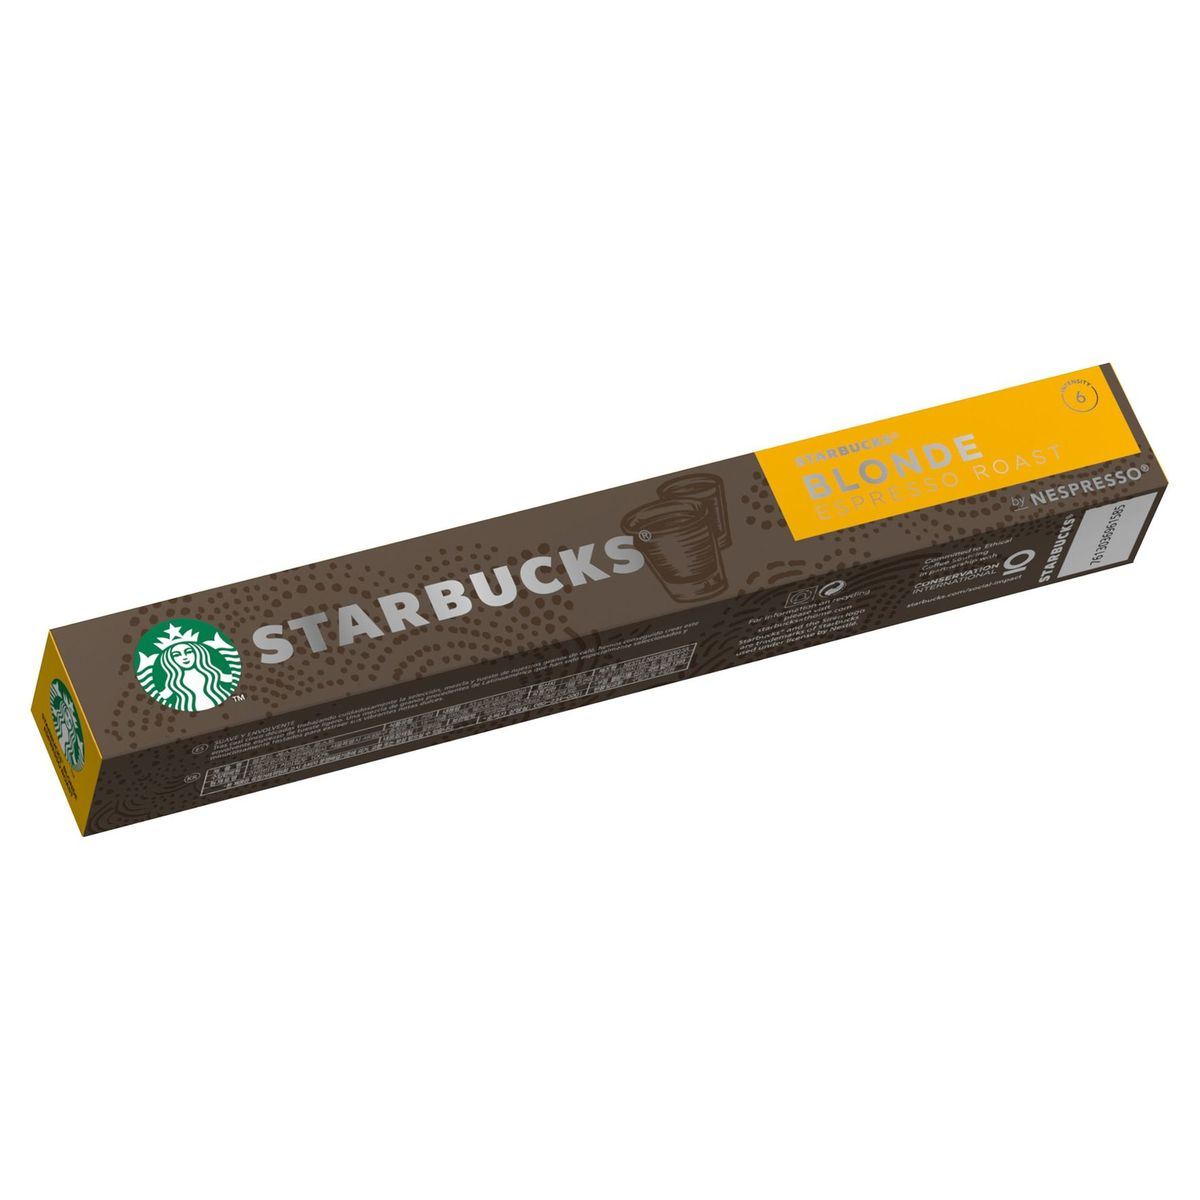 STARBUCKS by NESPRESSO Blonde Espresso Roast 10 capsules, 53g